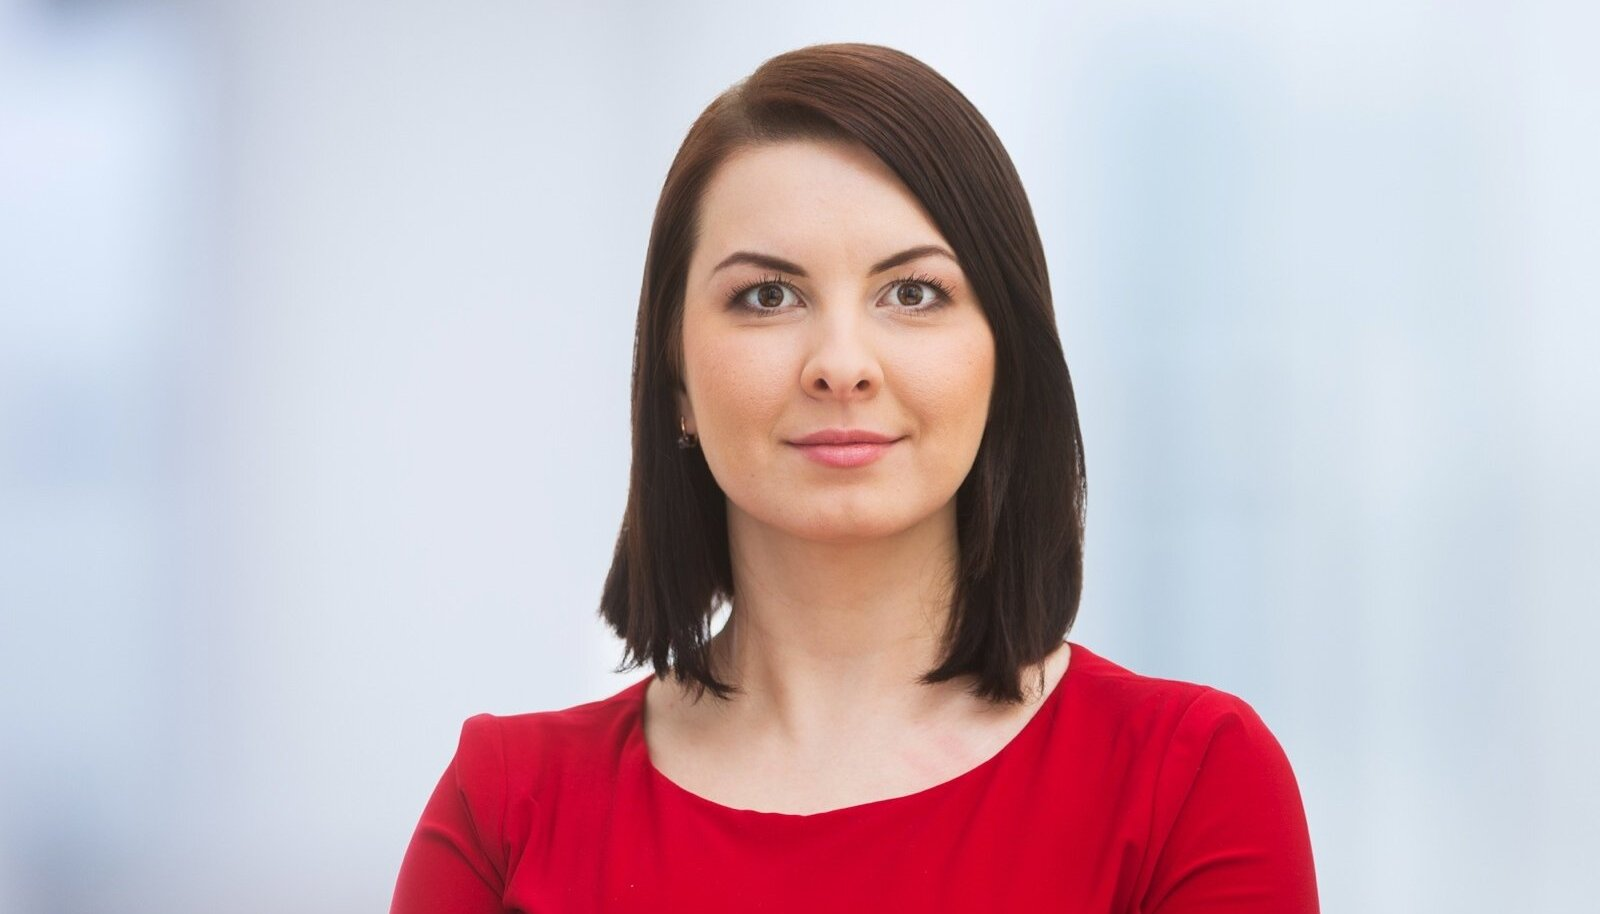 Redgate Capitali partner Valeria Kiisk